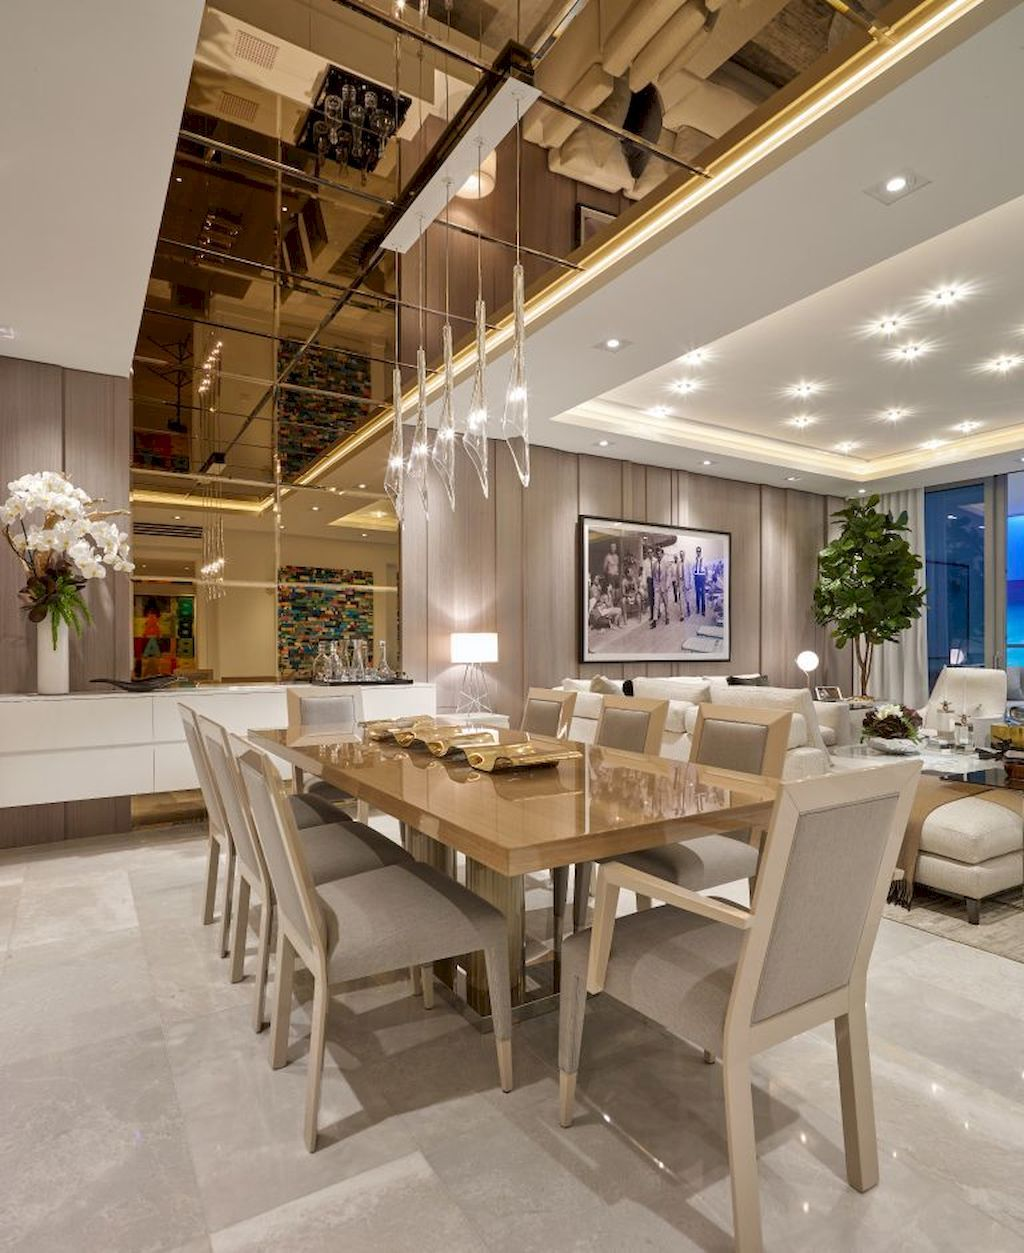 35 Luxury Dining Room Design Ideas: Luxury Dining Room Decoration Ideas